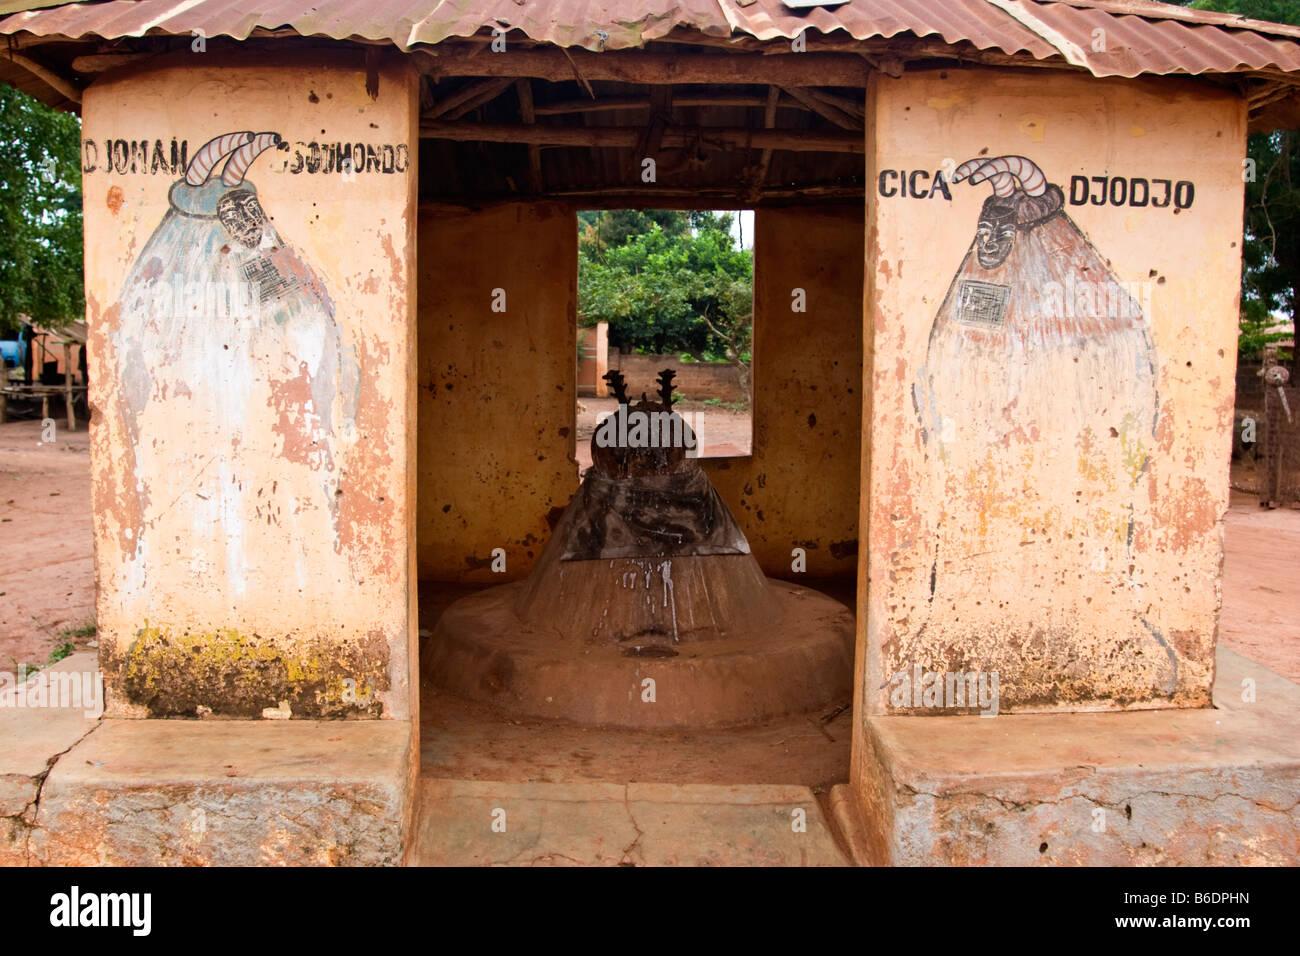 Small voodoo shrine in Abomey, Benin. - Stock Image